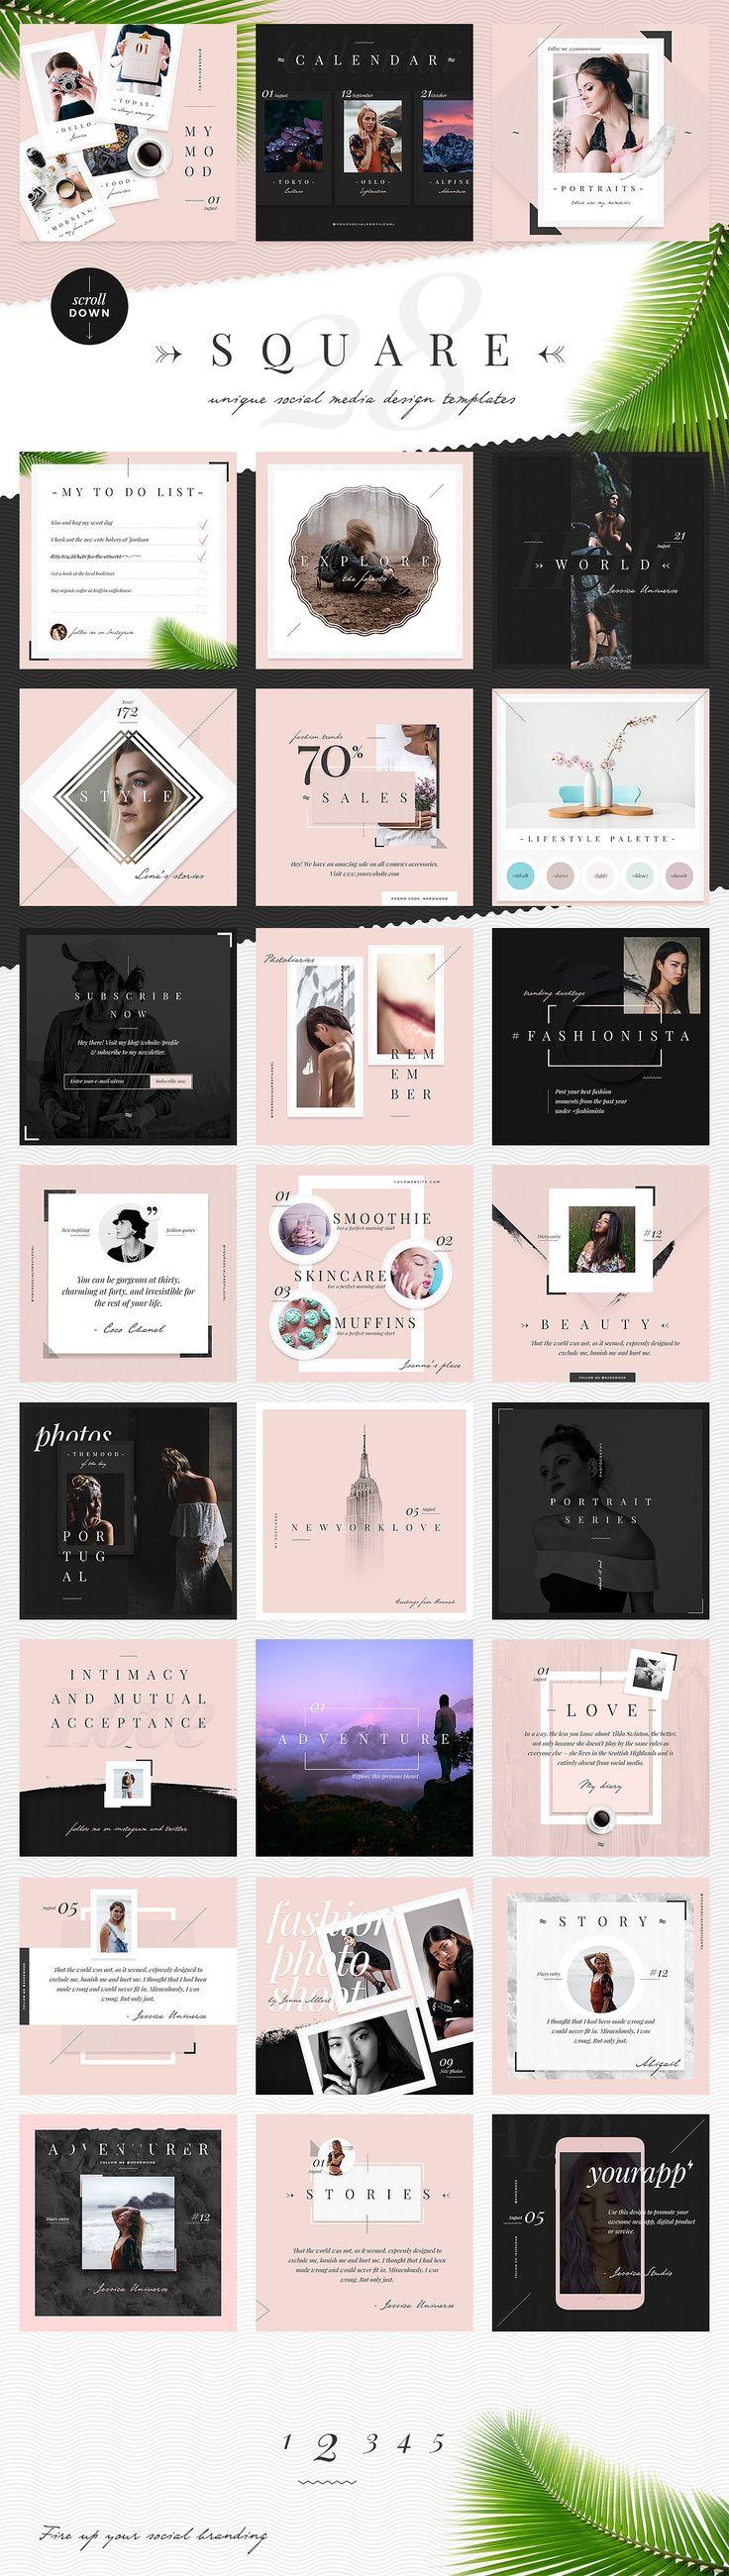 Venice: Elegant Social Media Designs Template PSD